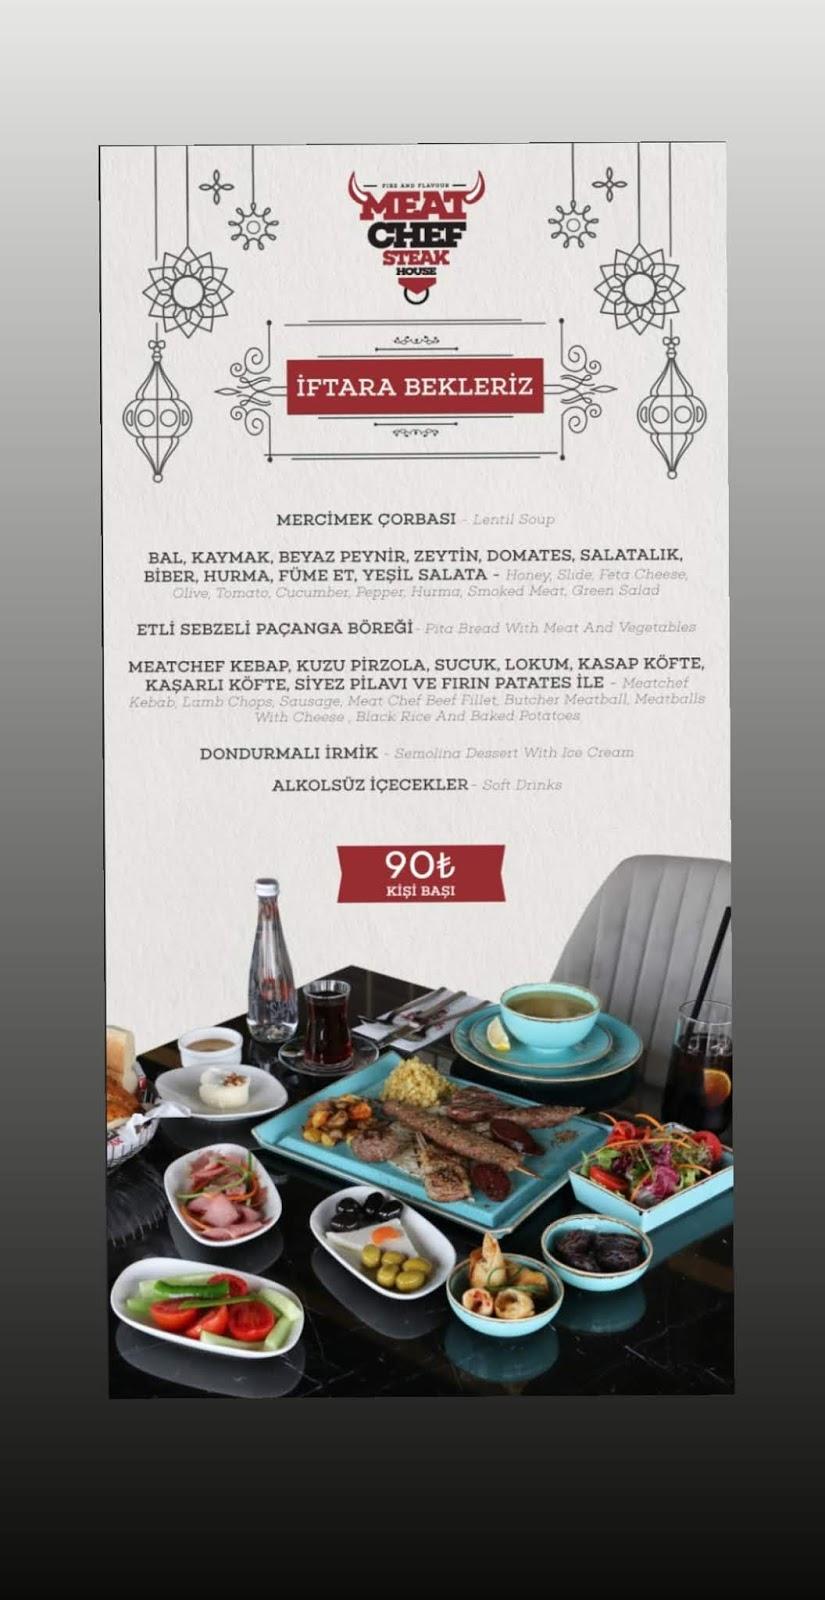 meat chef kartal ist marina yemek yerleri kartal iftar mekanları 2019 kartal iftar restaurant kartal iftarlık yerler